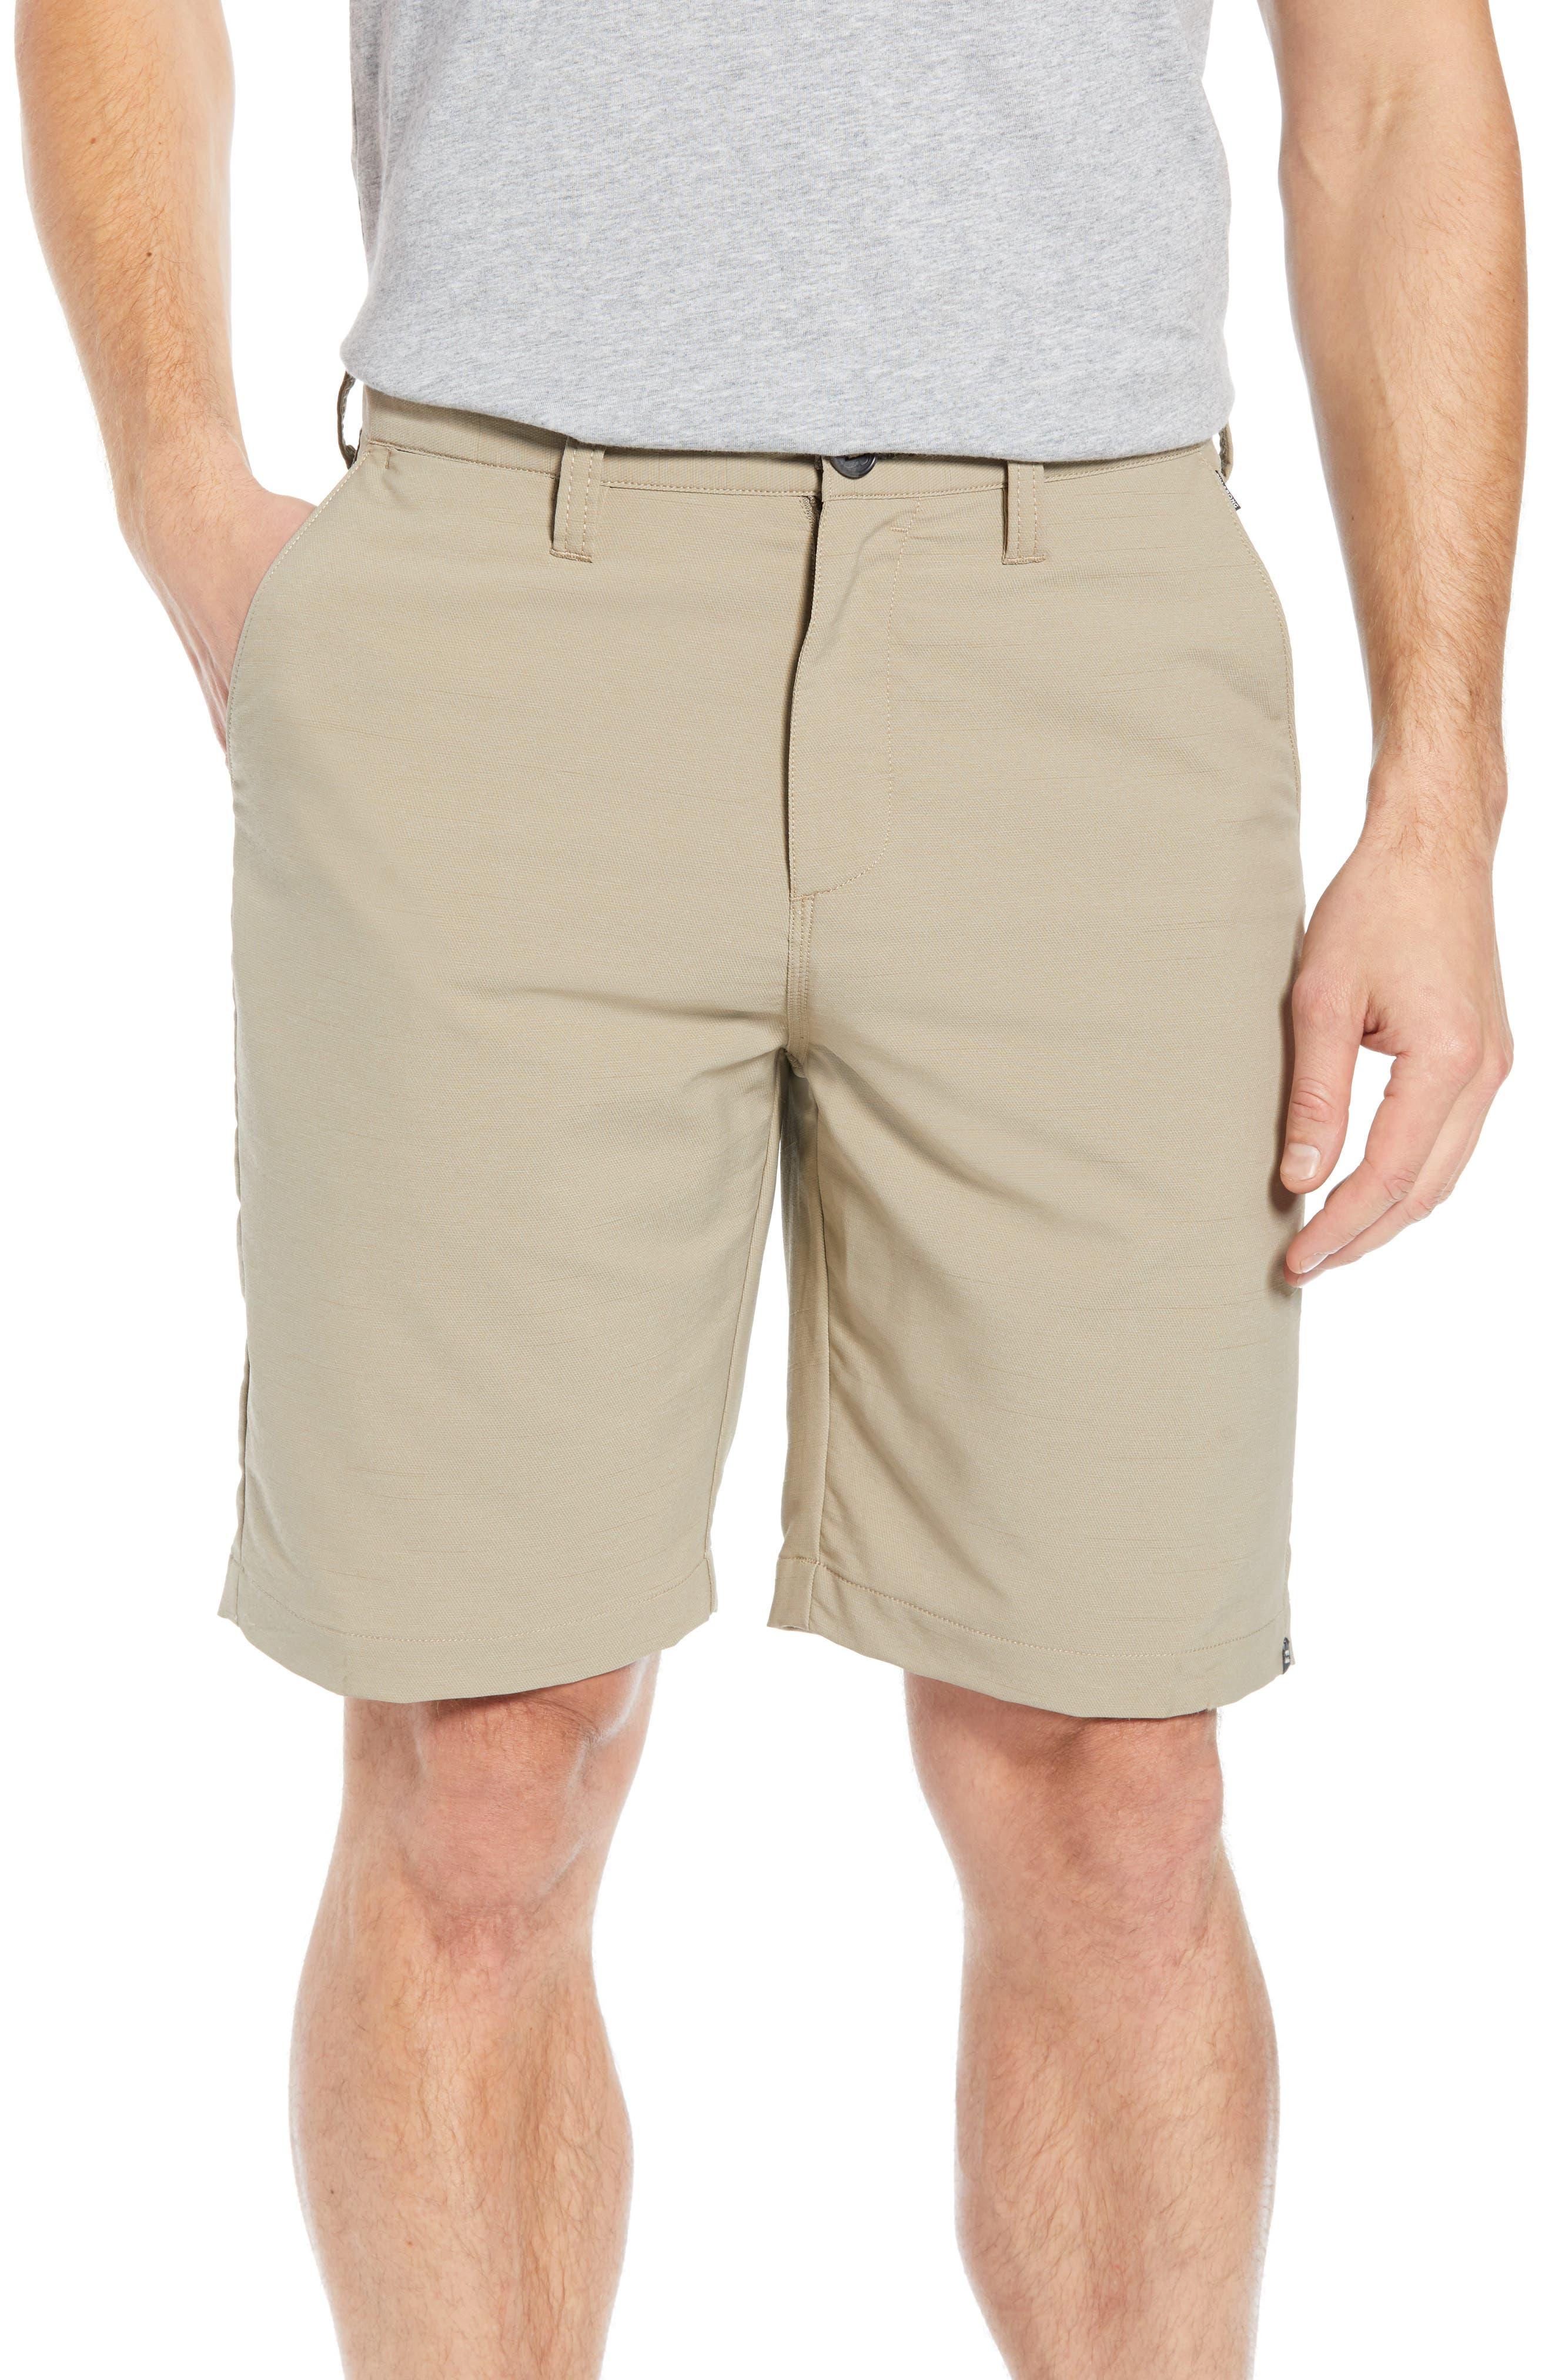 Surfreak Hybrid Shorts,                             Main thumbnail 1, color,                             KHAKI